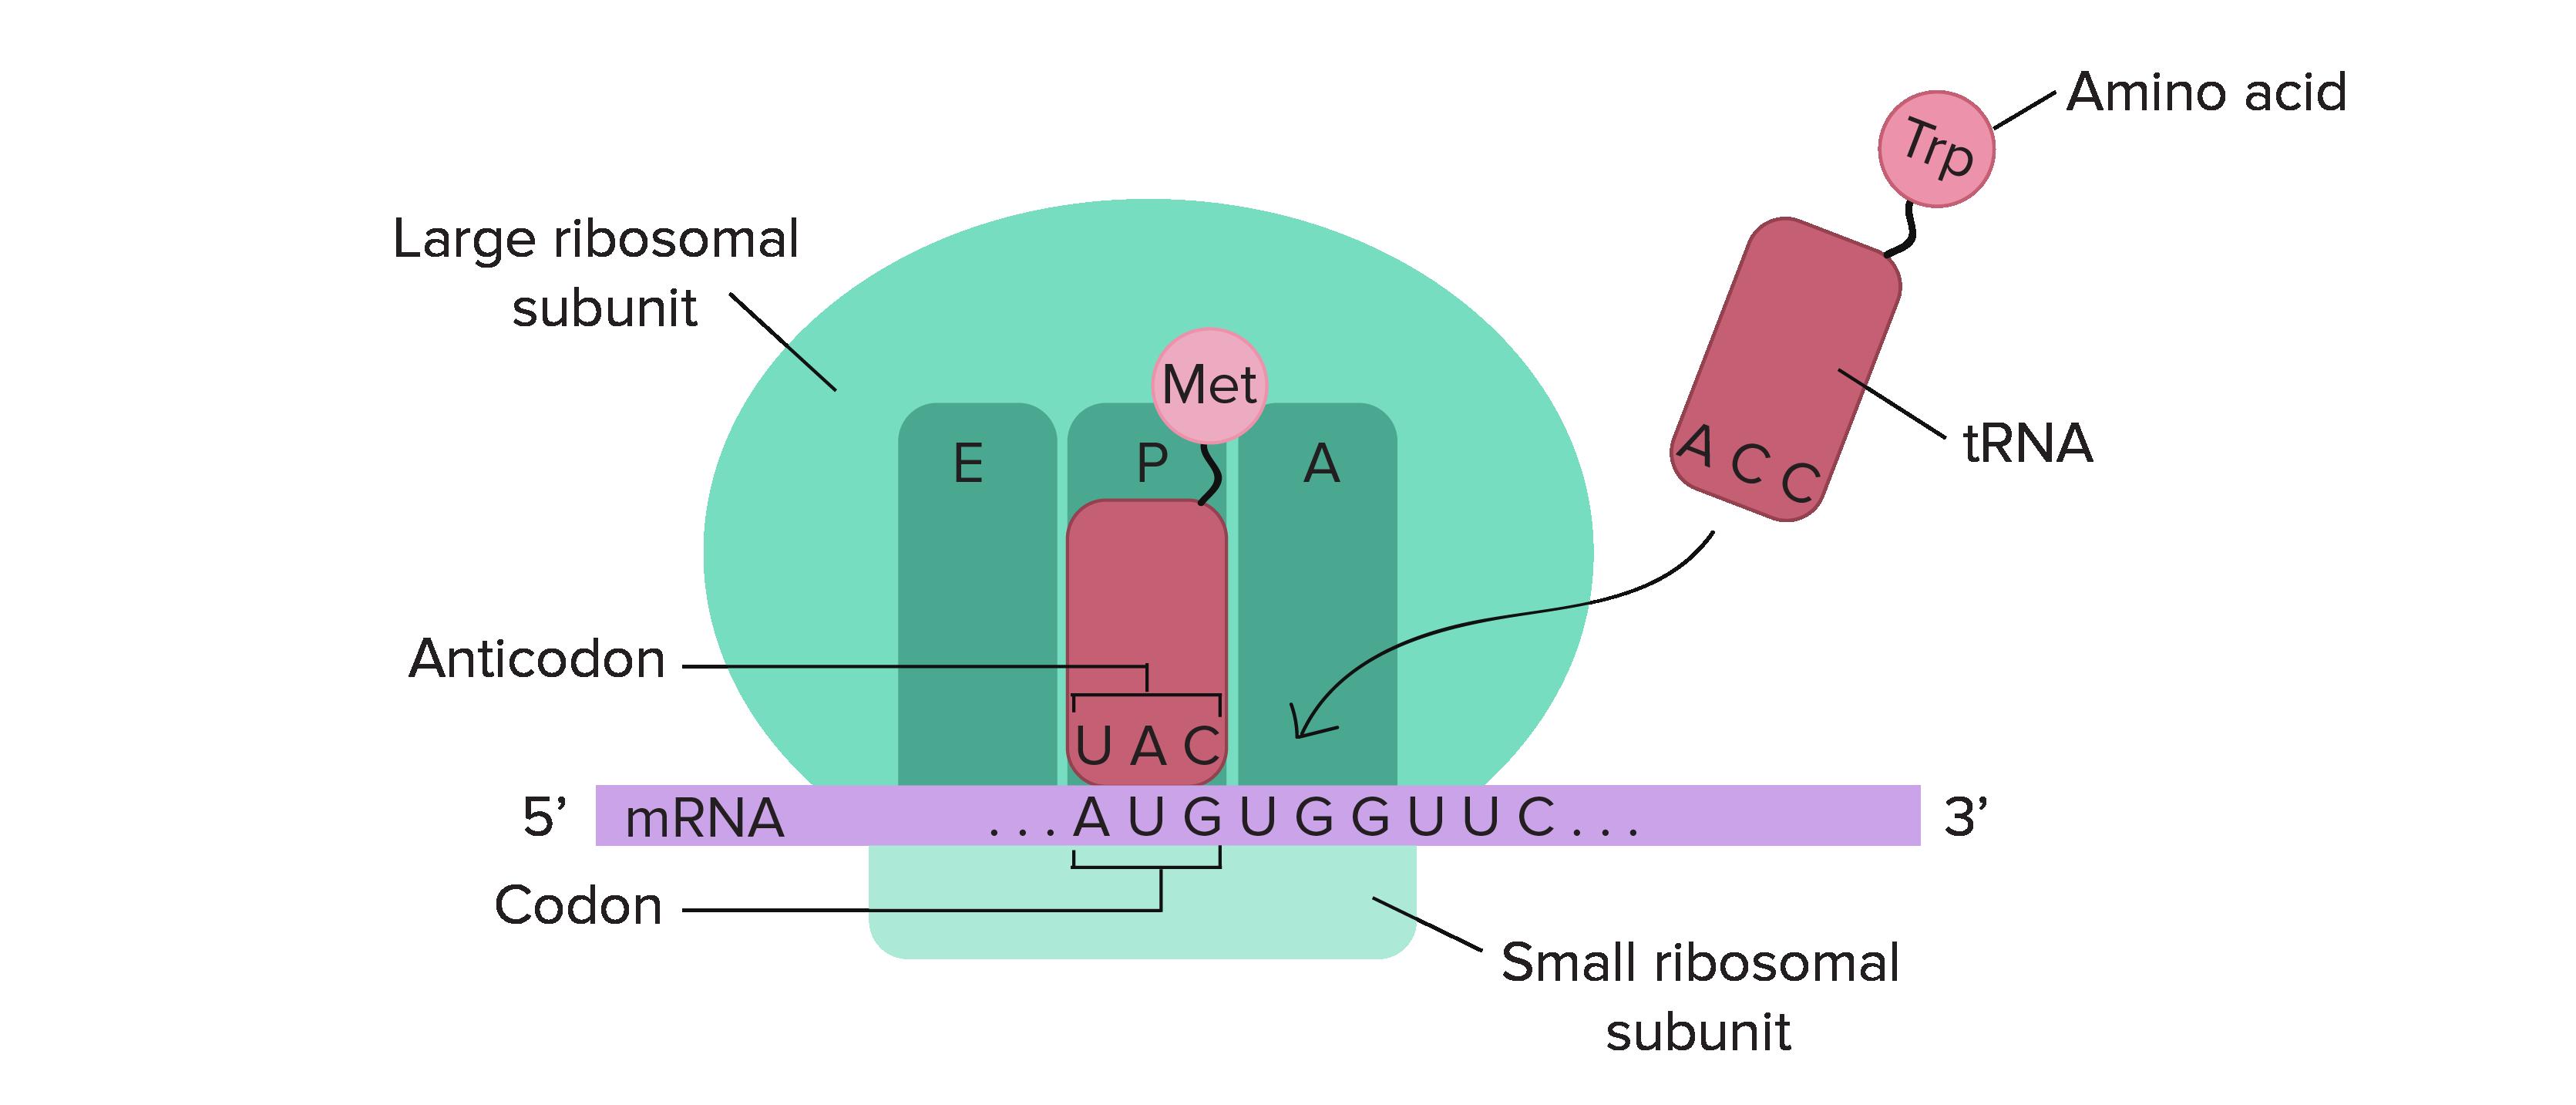 https://www.khanacademy.org/science/biology/gene-expression-central-dogma/translation-polypeptides/a/translation-overview